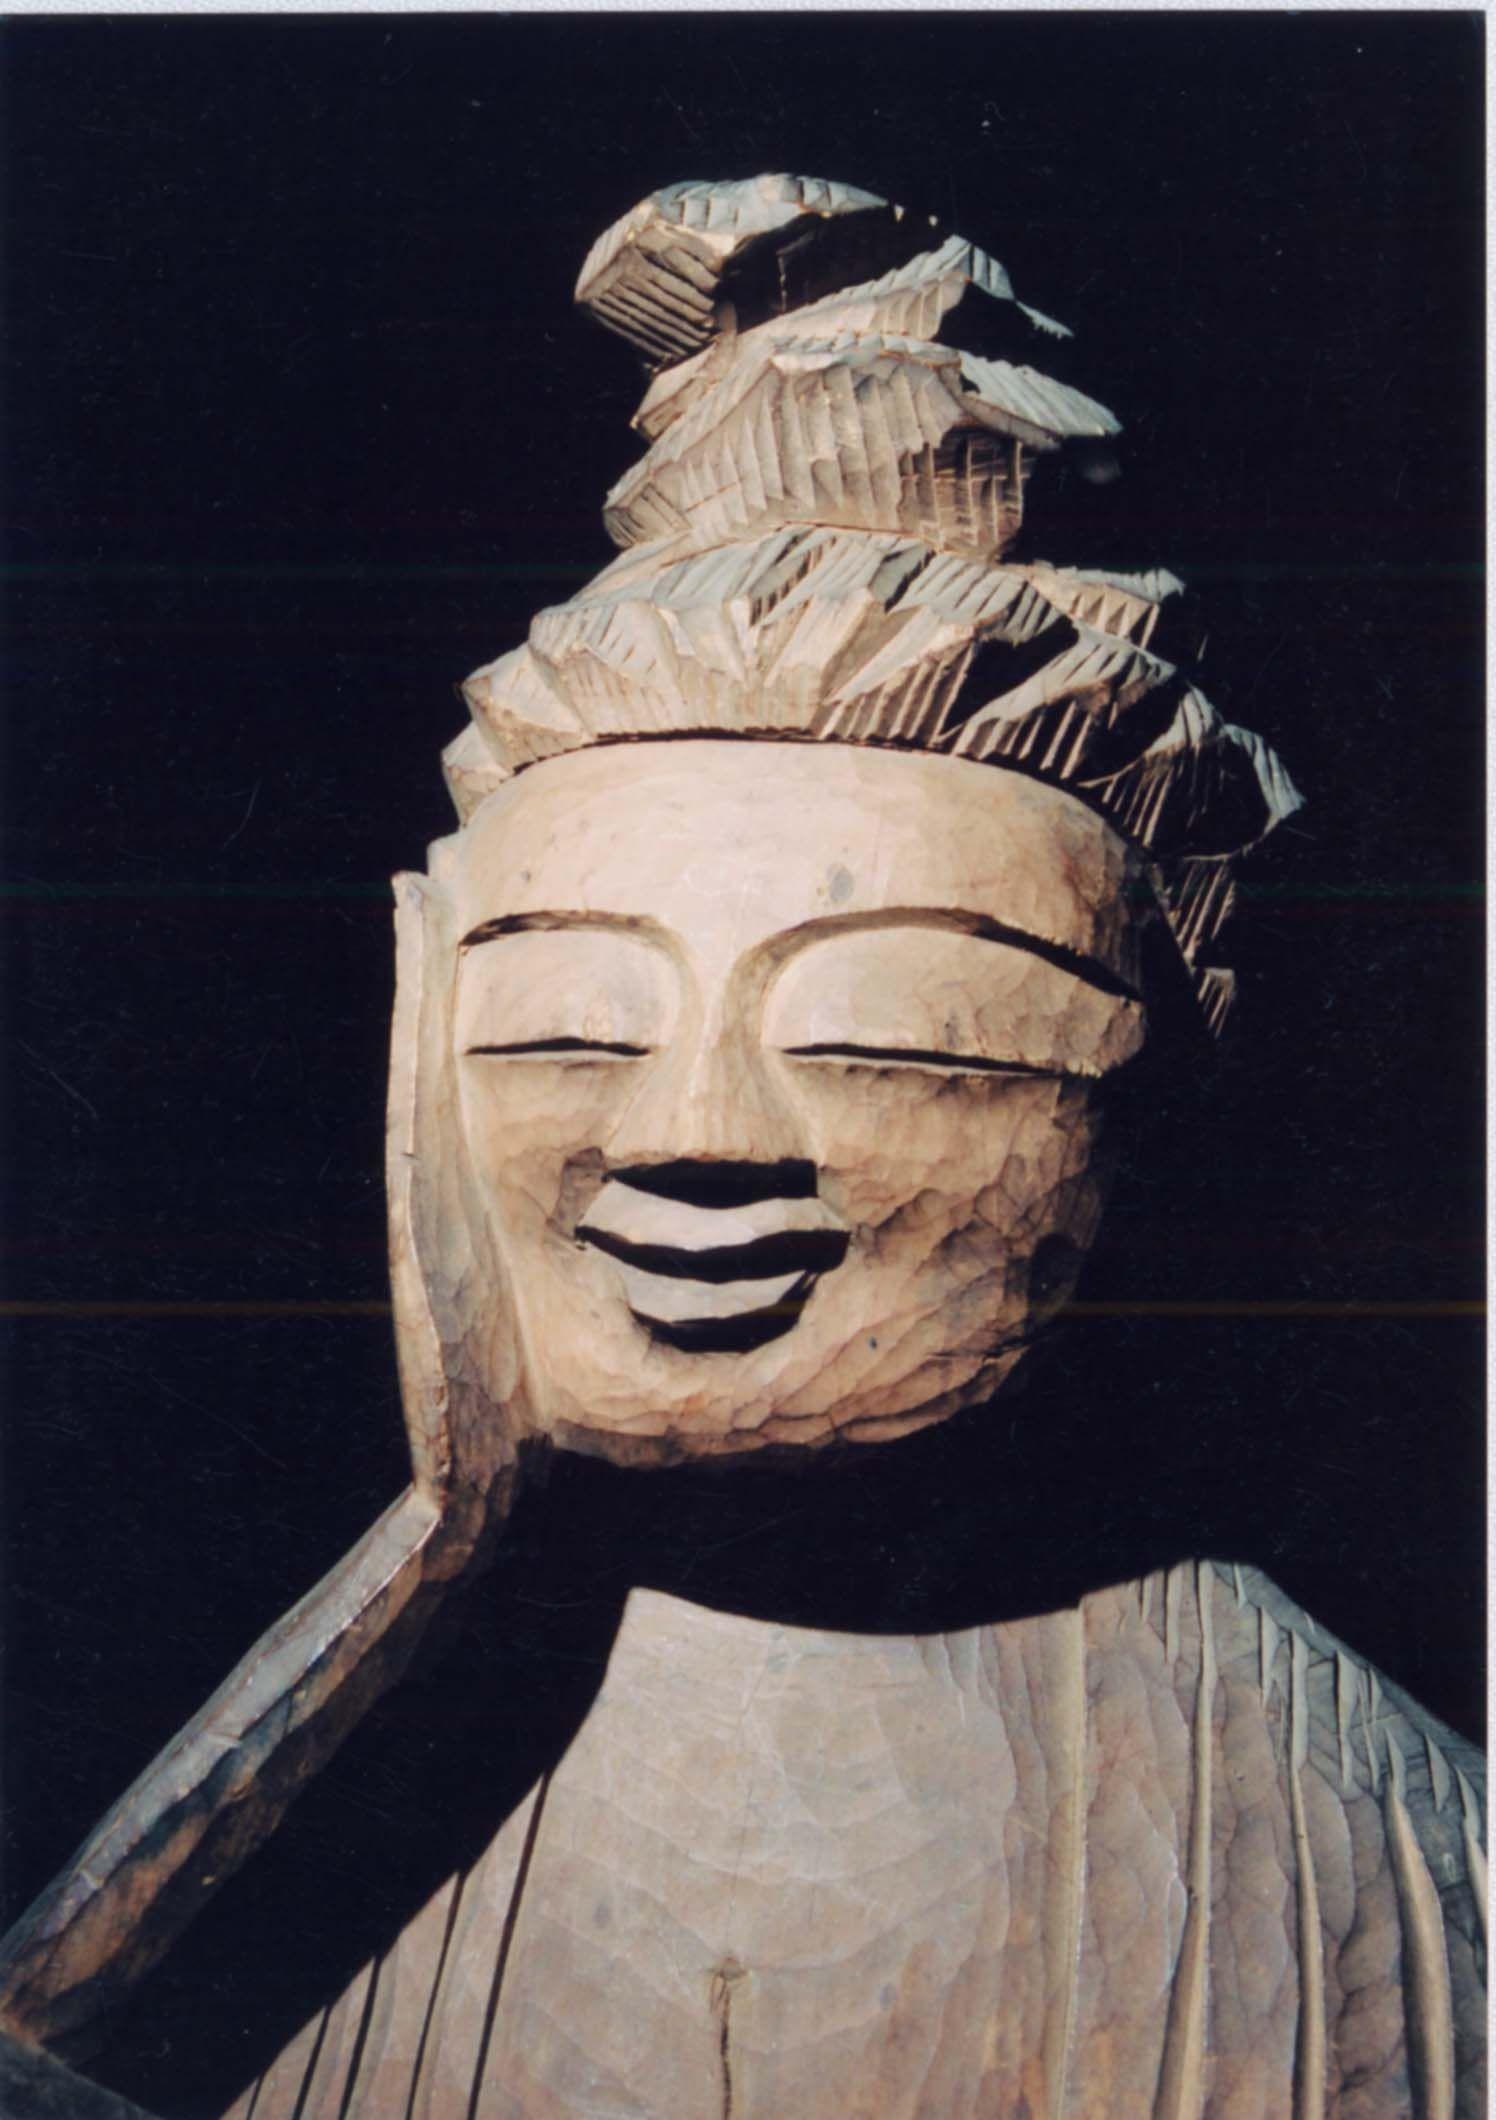 Enkū 円空 1632u20131695 was a japanesebuddhist monk and sculptor